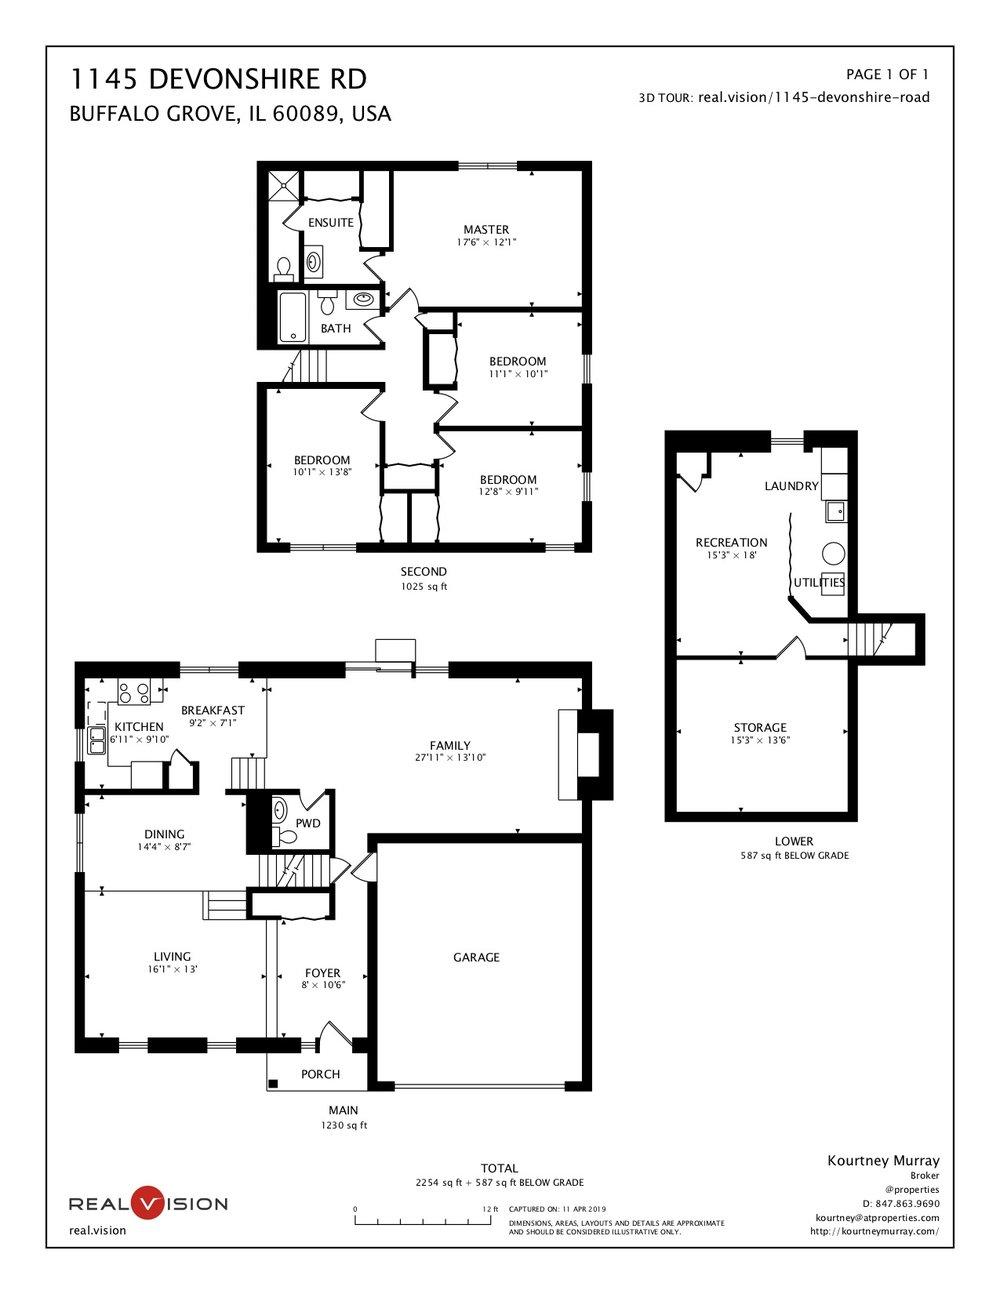 1145-devonshire-road-buffalo-grove-floor-plan.jpg